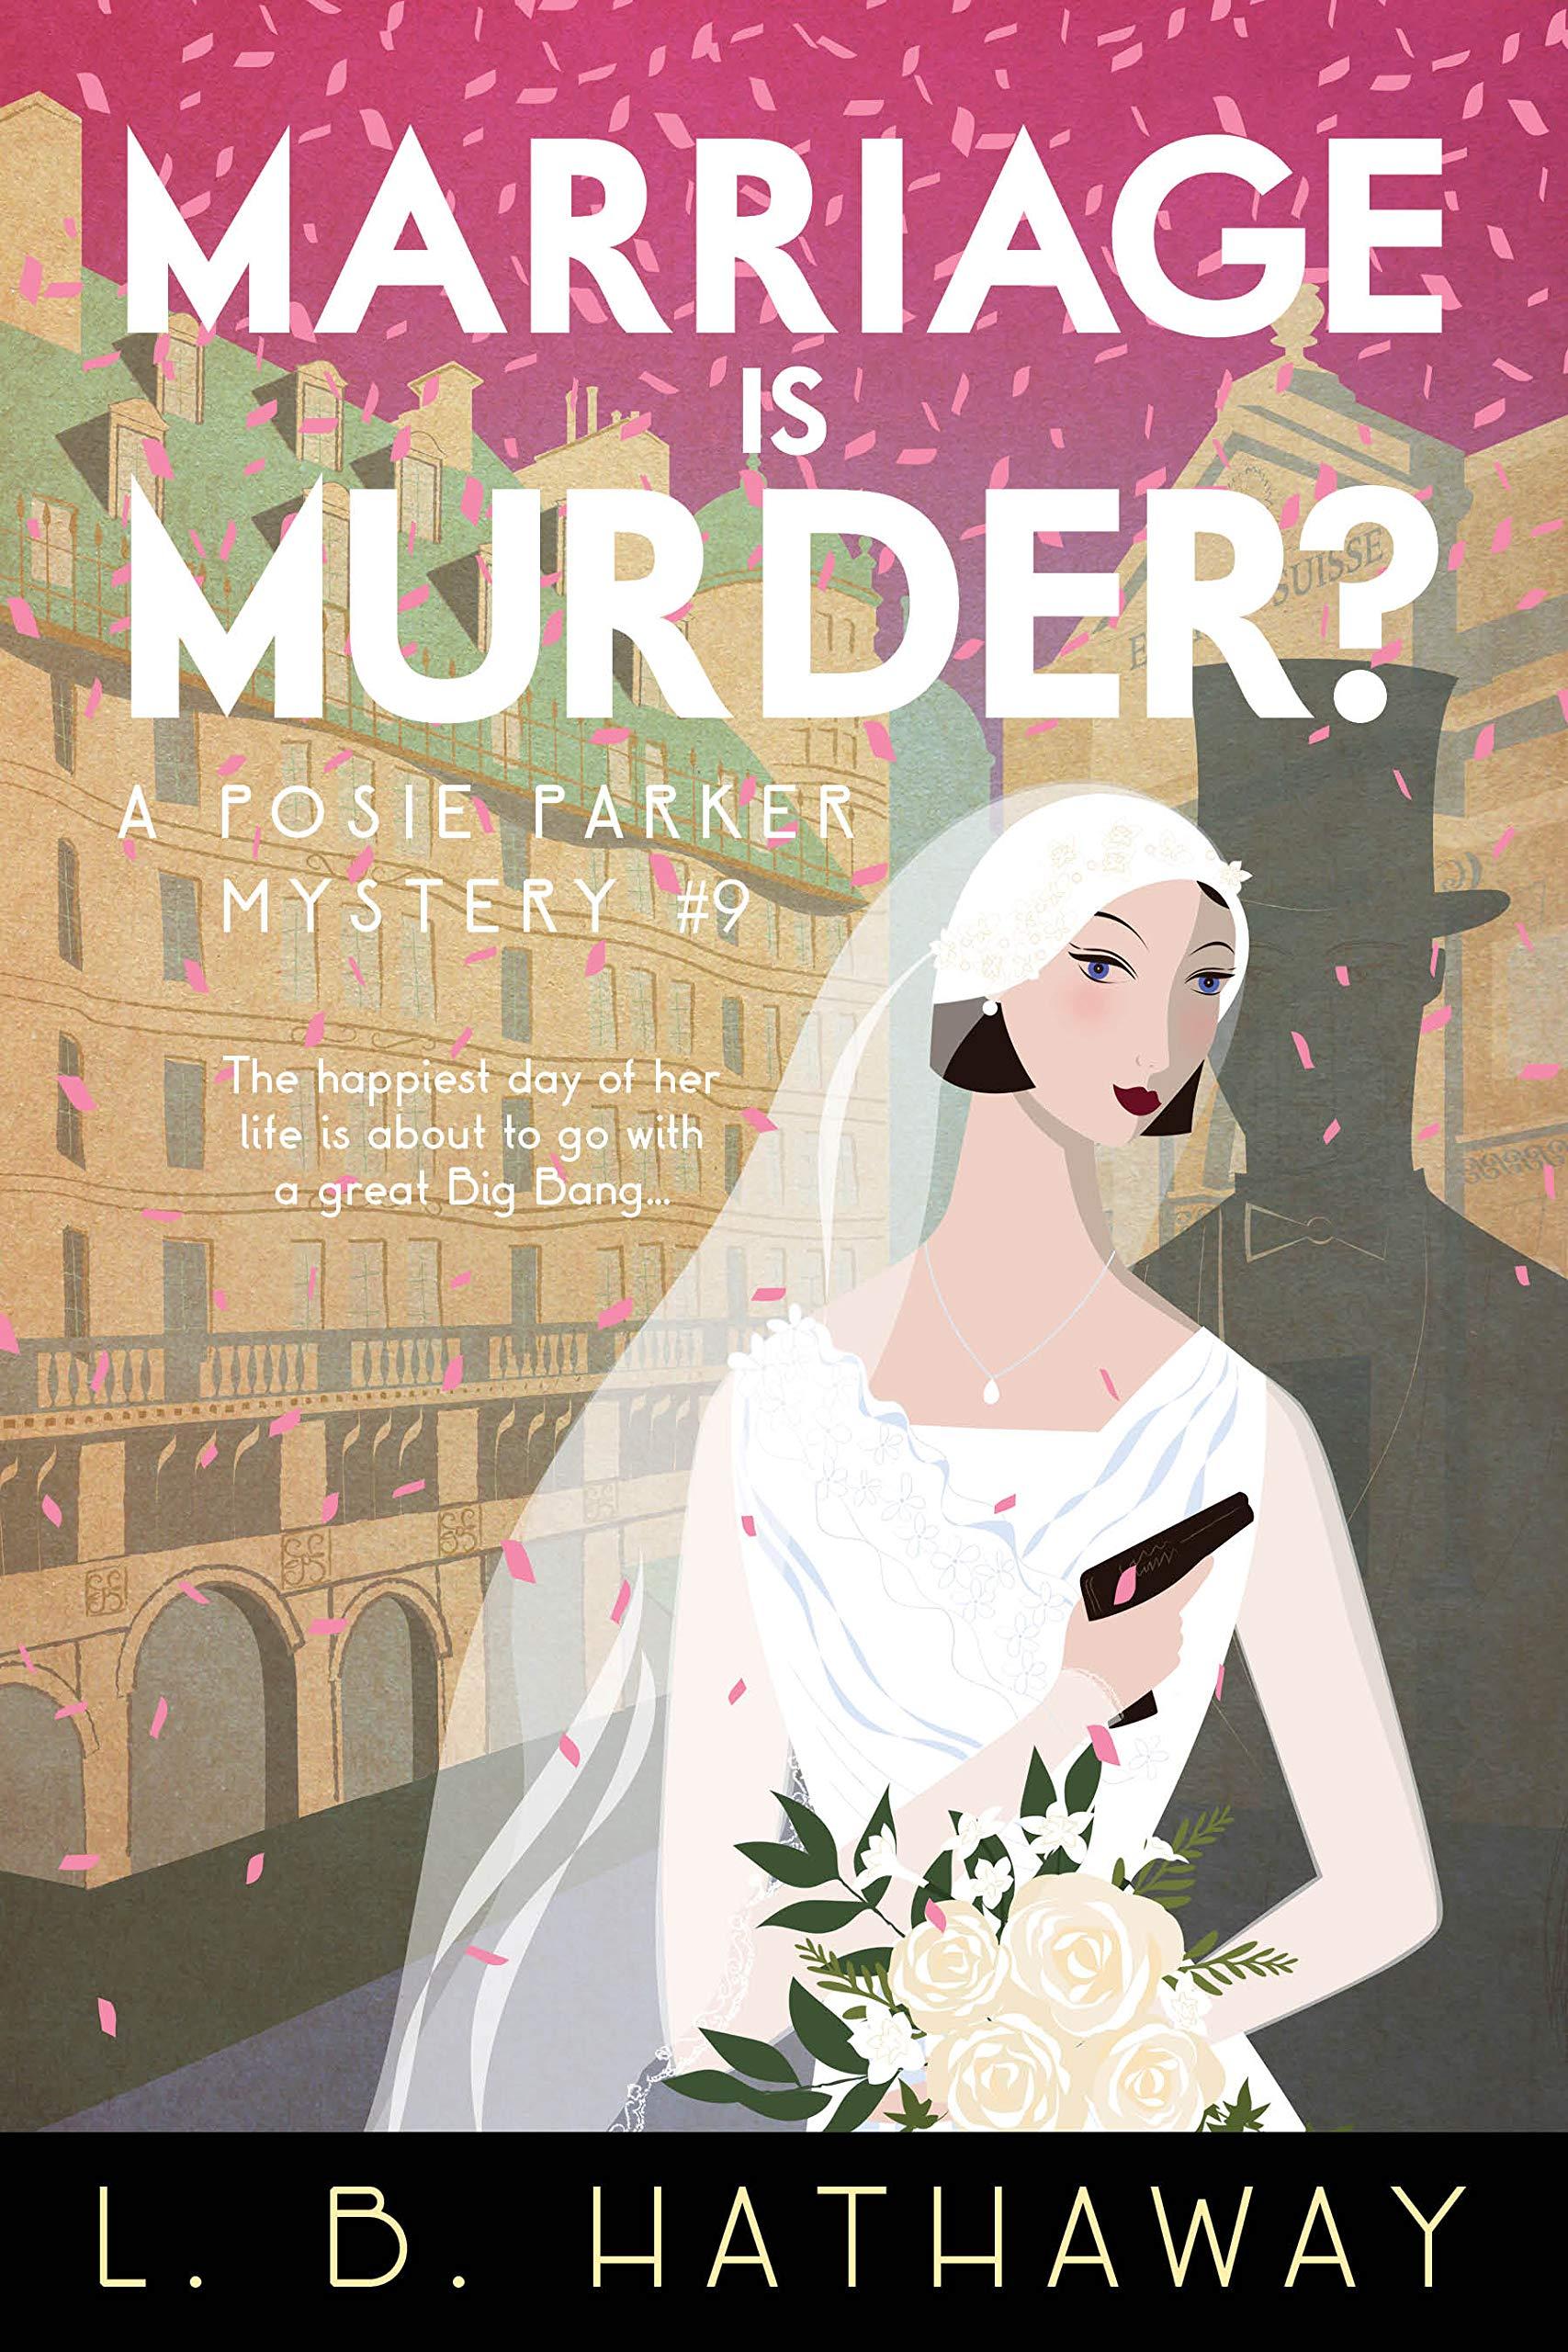 Marriage is Murder?